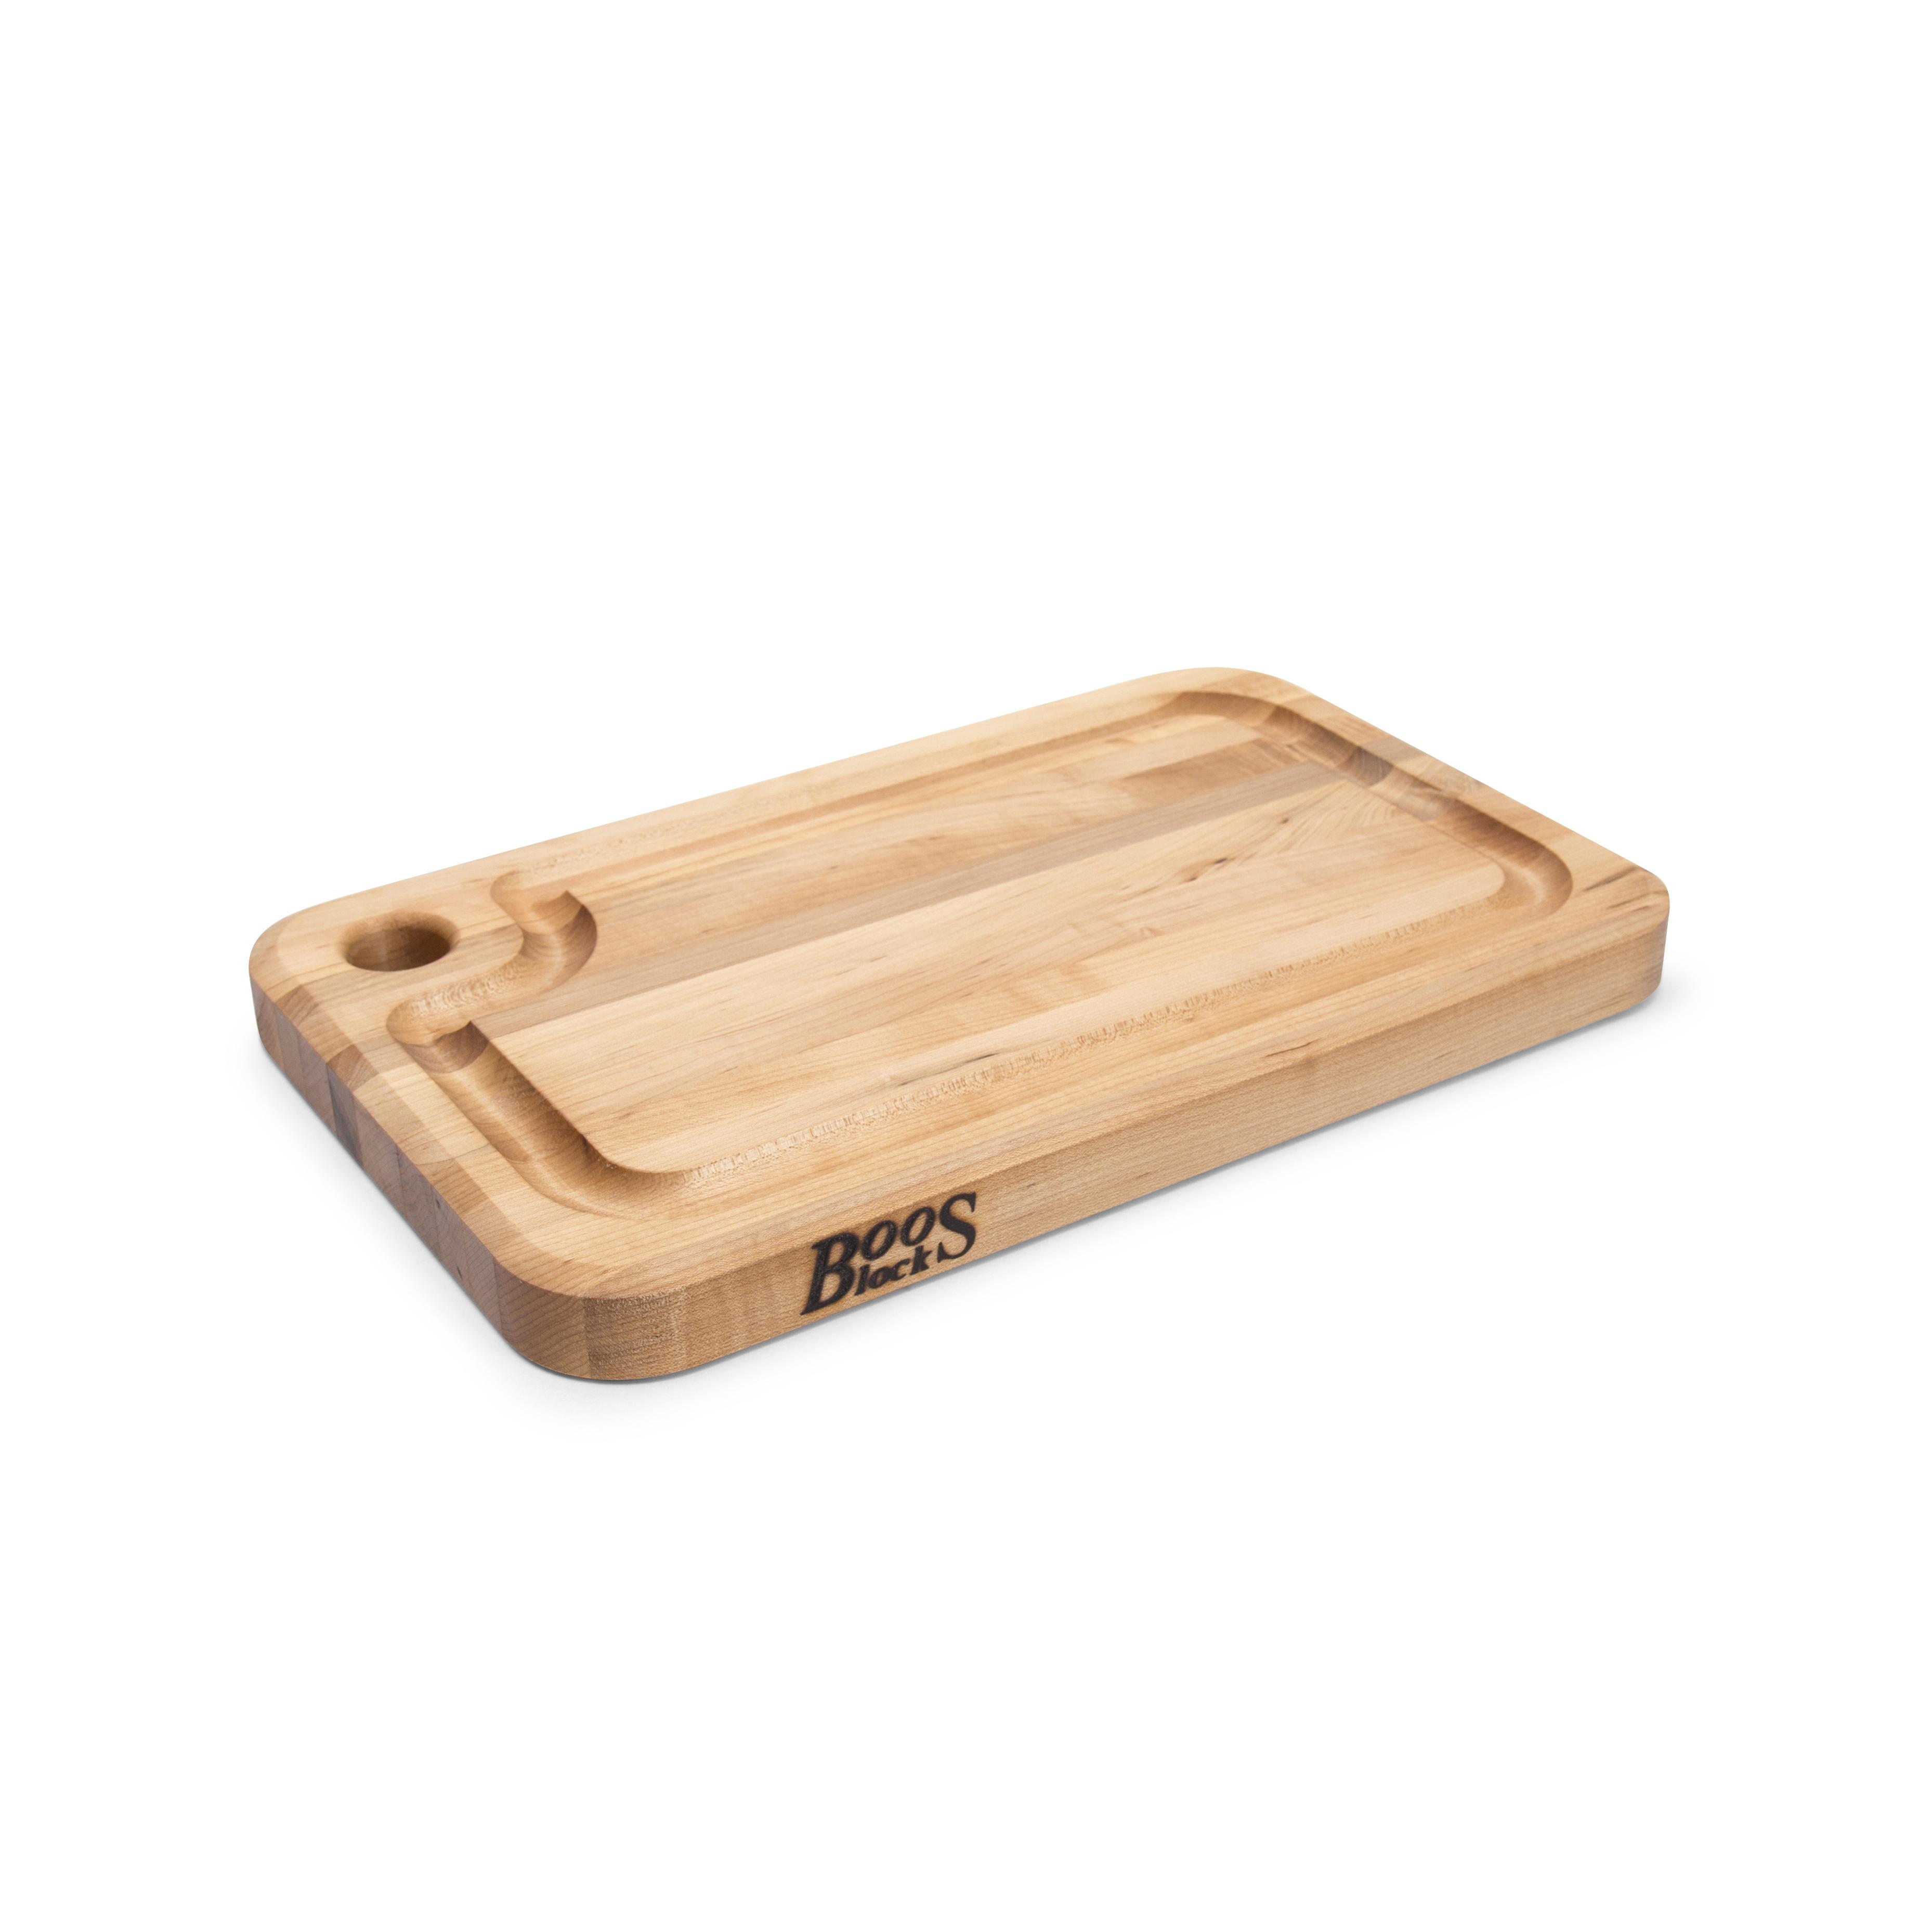 John Boos MPL1610125-FH-GRV cutting board, wood